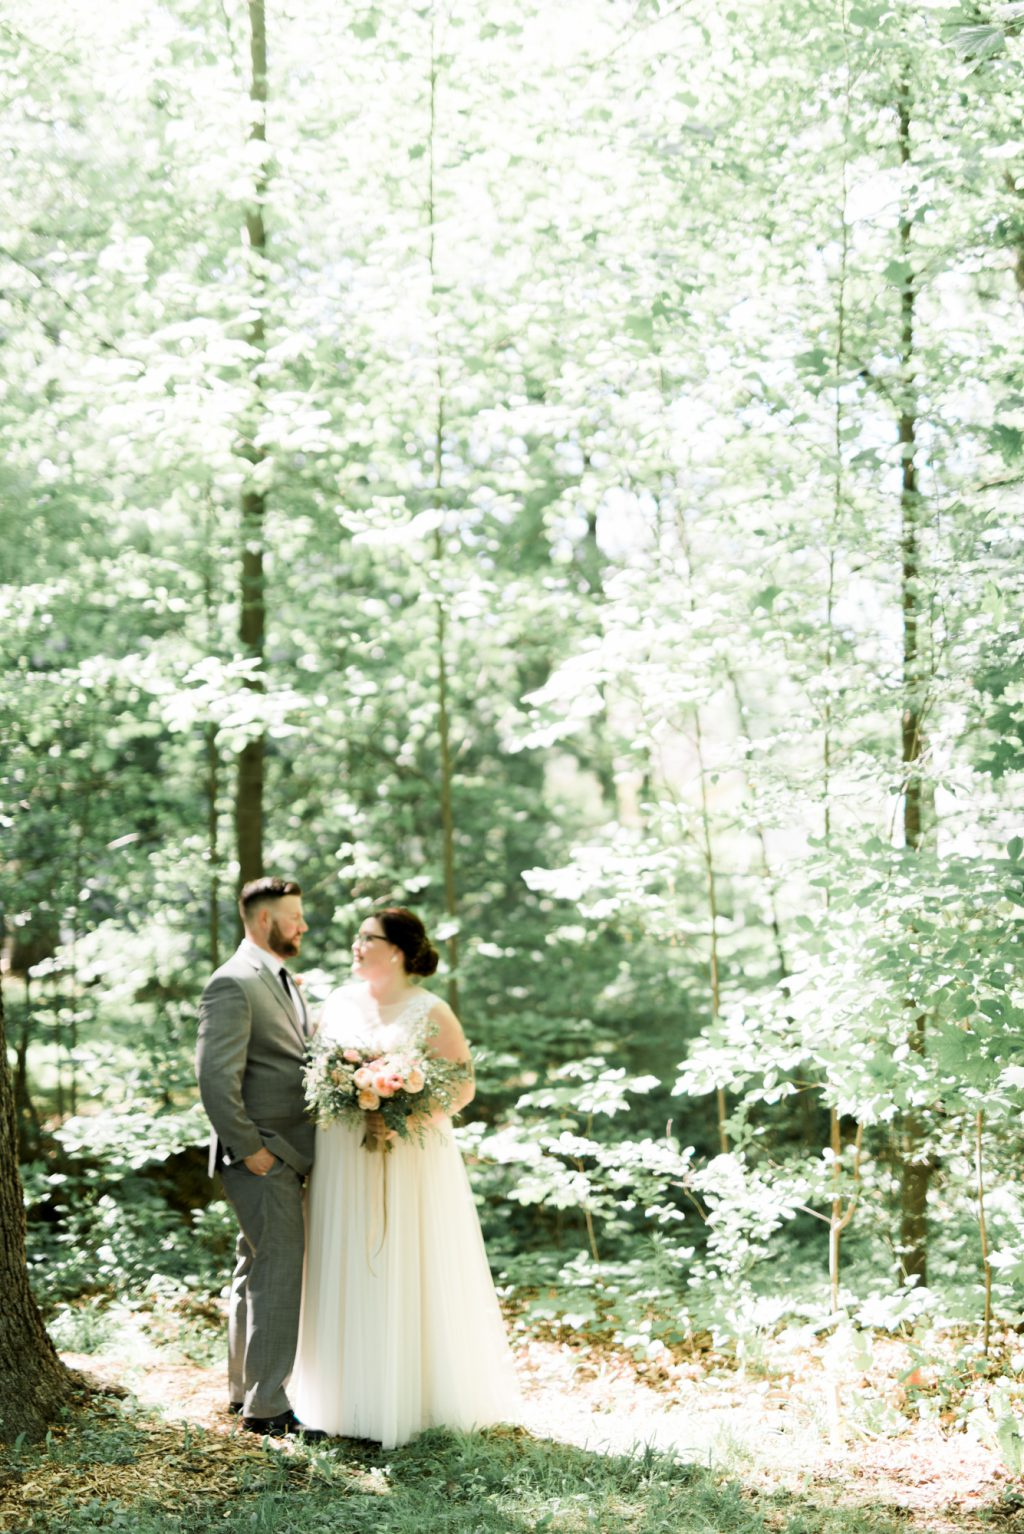 haley-richter-photo-west-chester-summer-wedding-boxcar-brewery-091